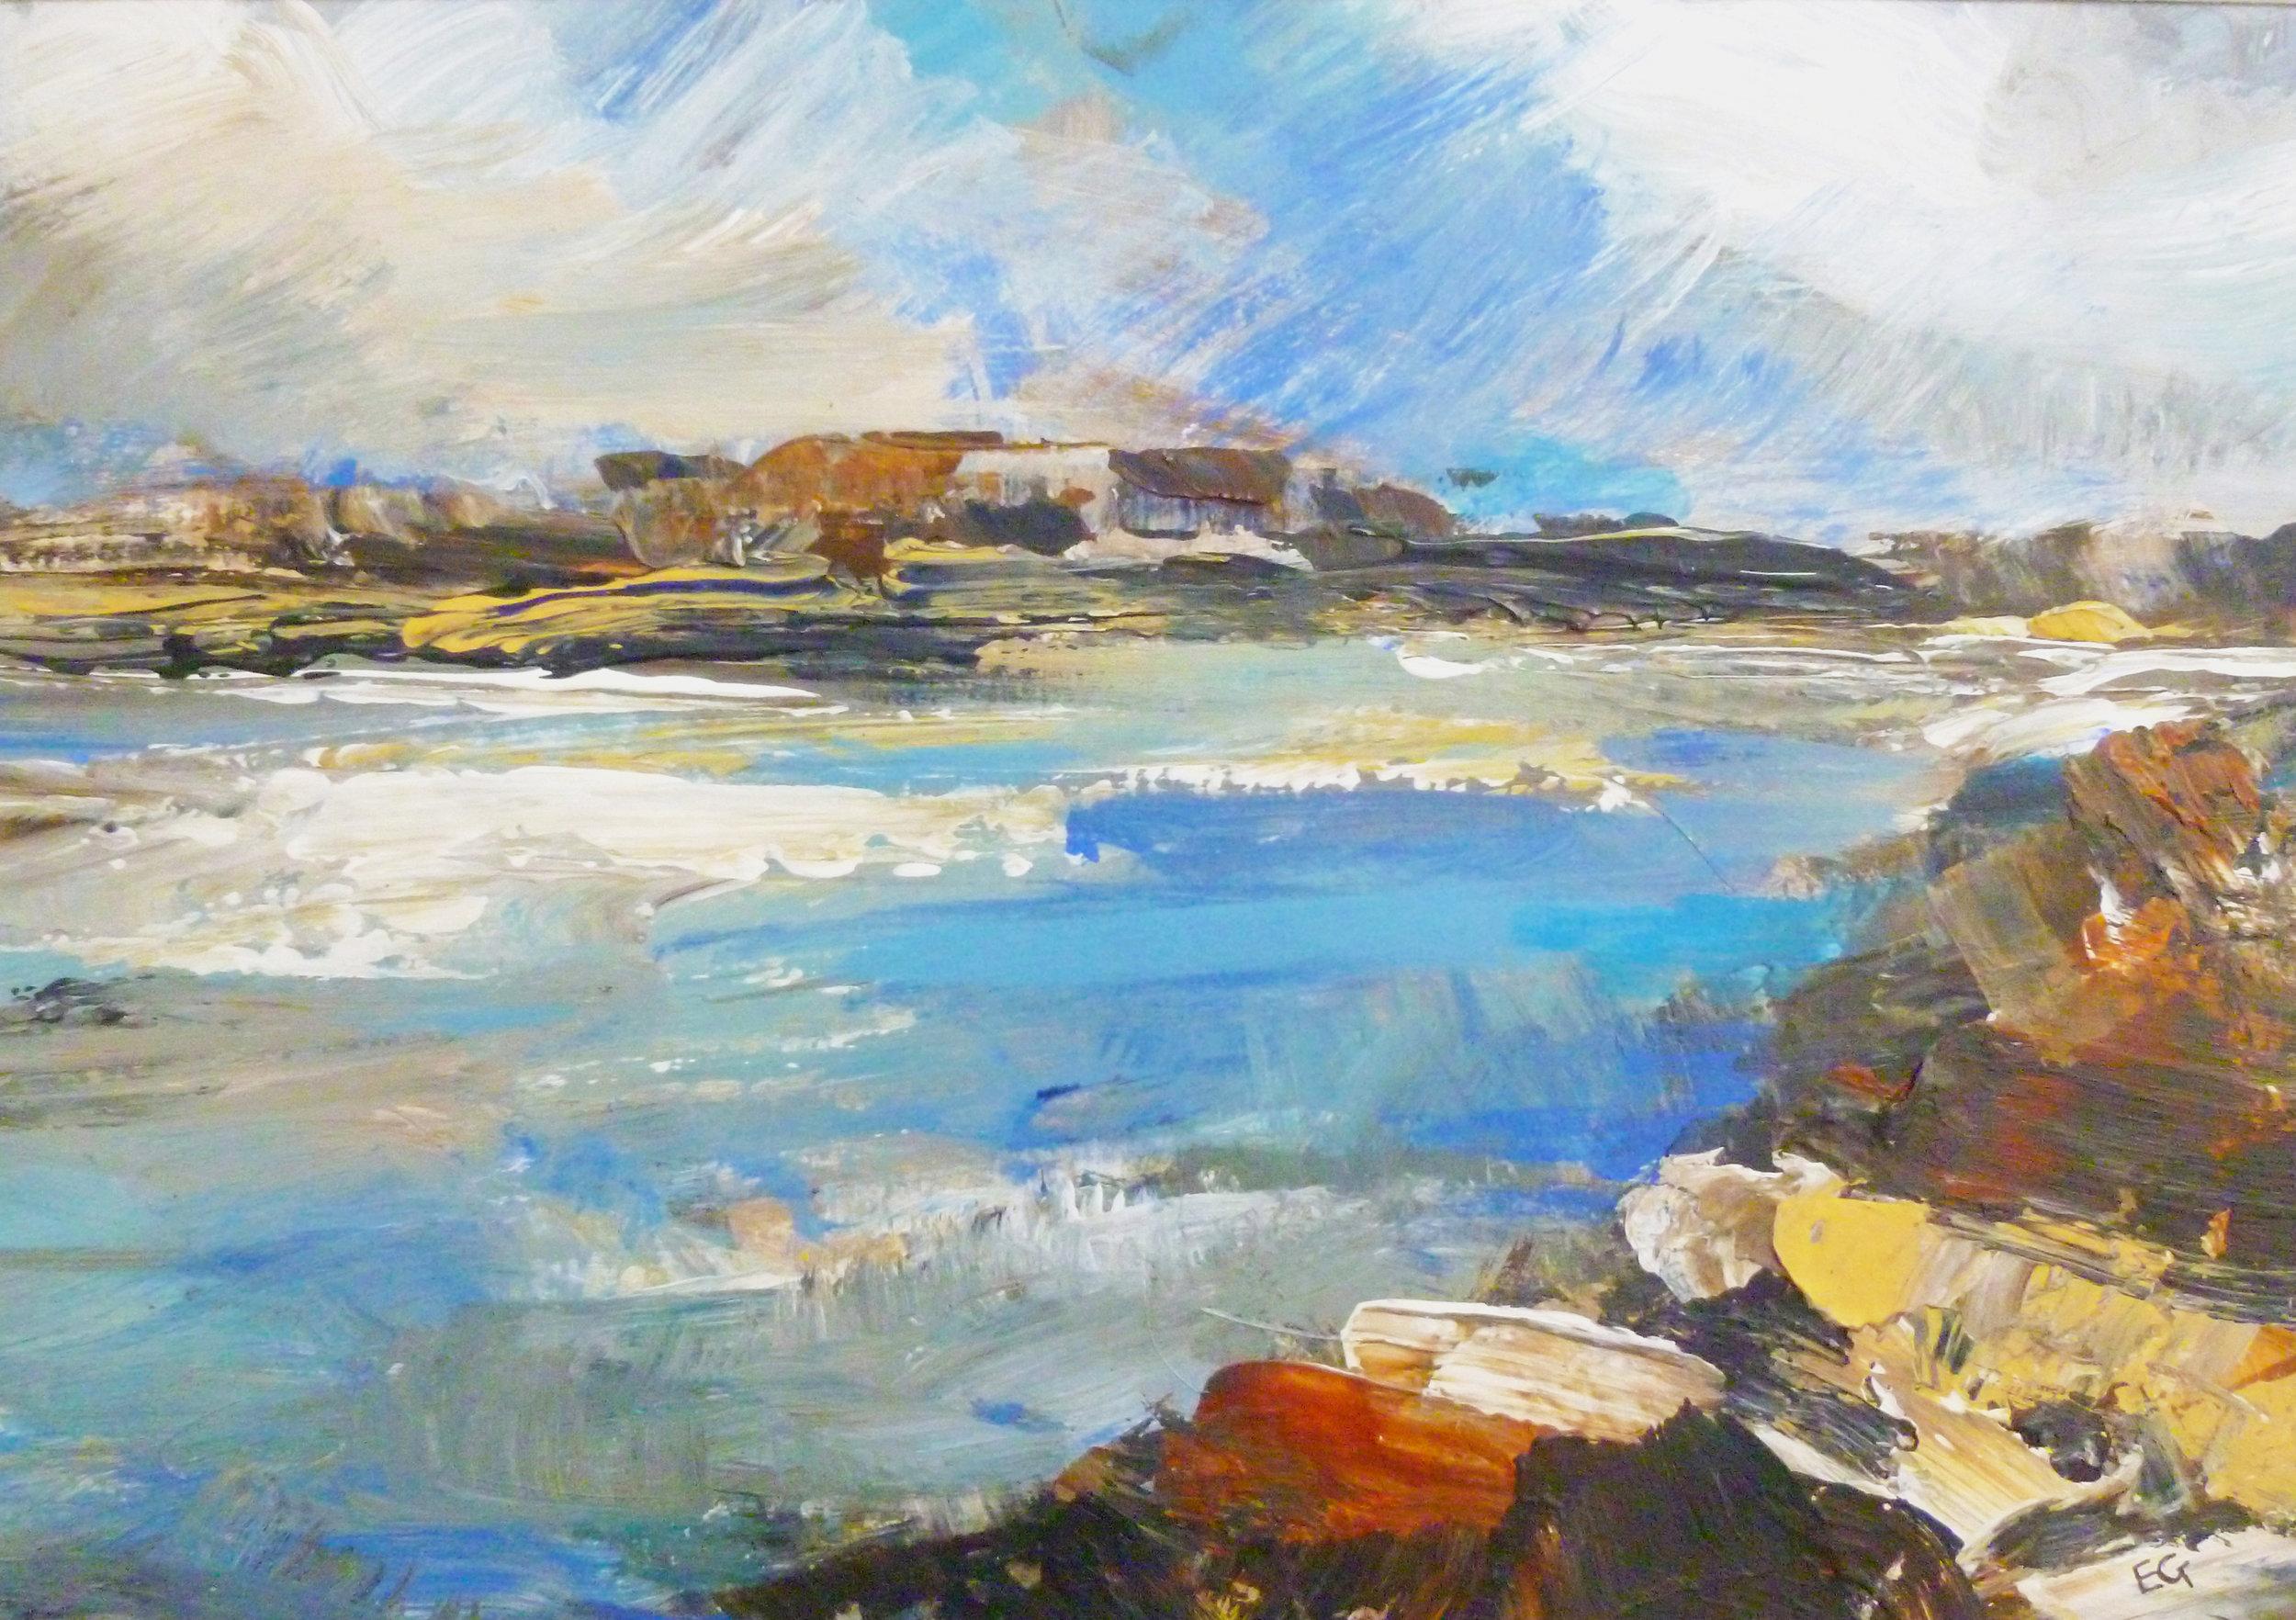 Elaine Graham 'Pembrokeshire Coastal' acrylic on board